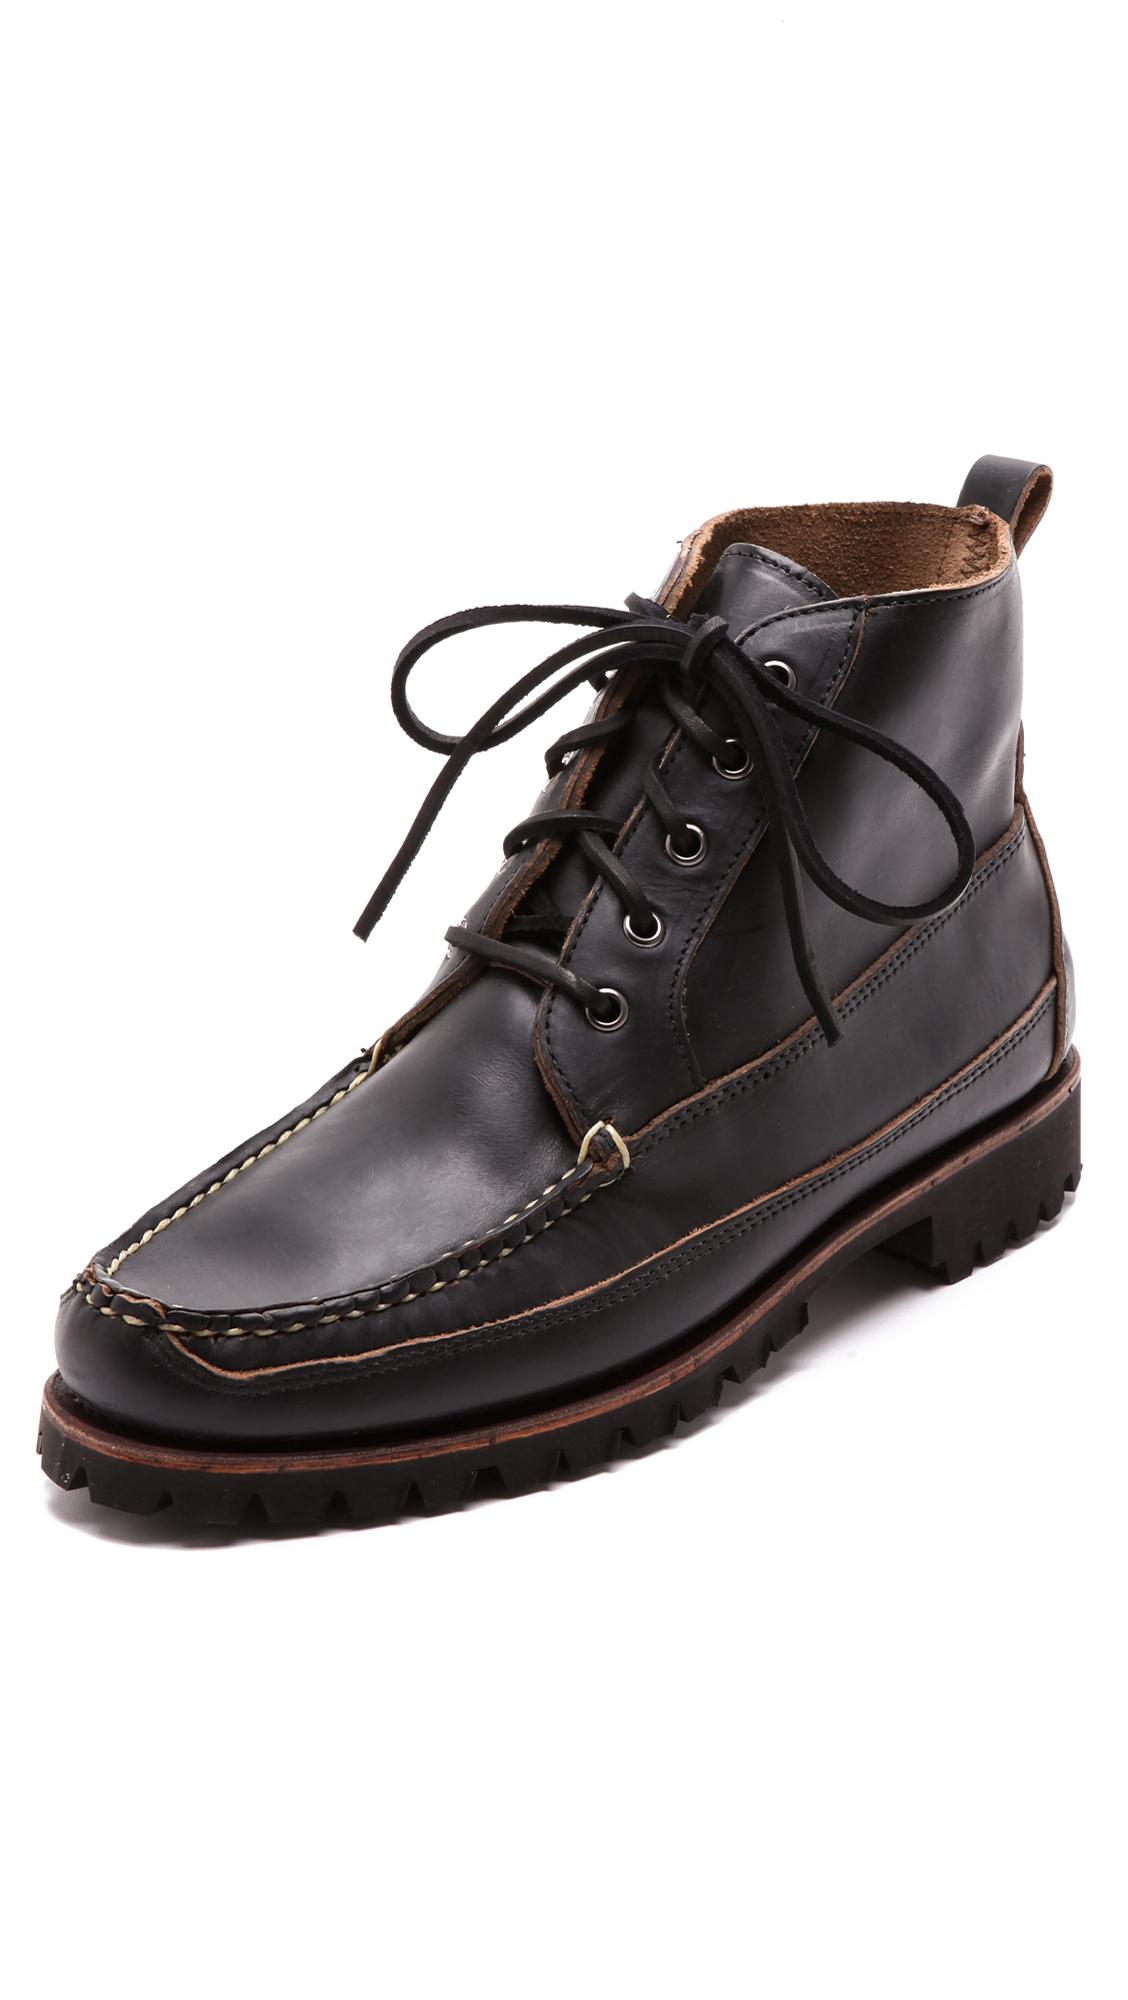 Eastland Kennebunk Usa Boots In Black For Men Lyst